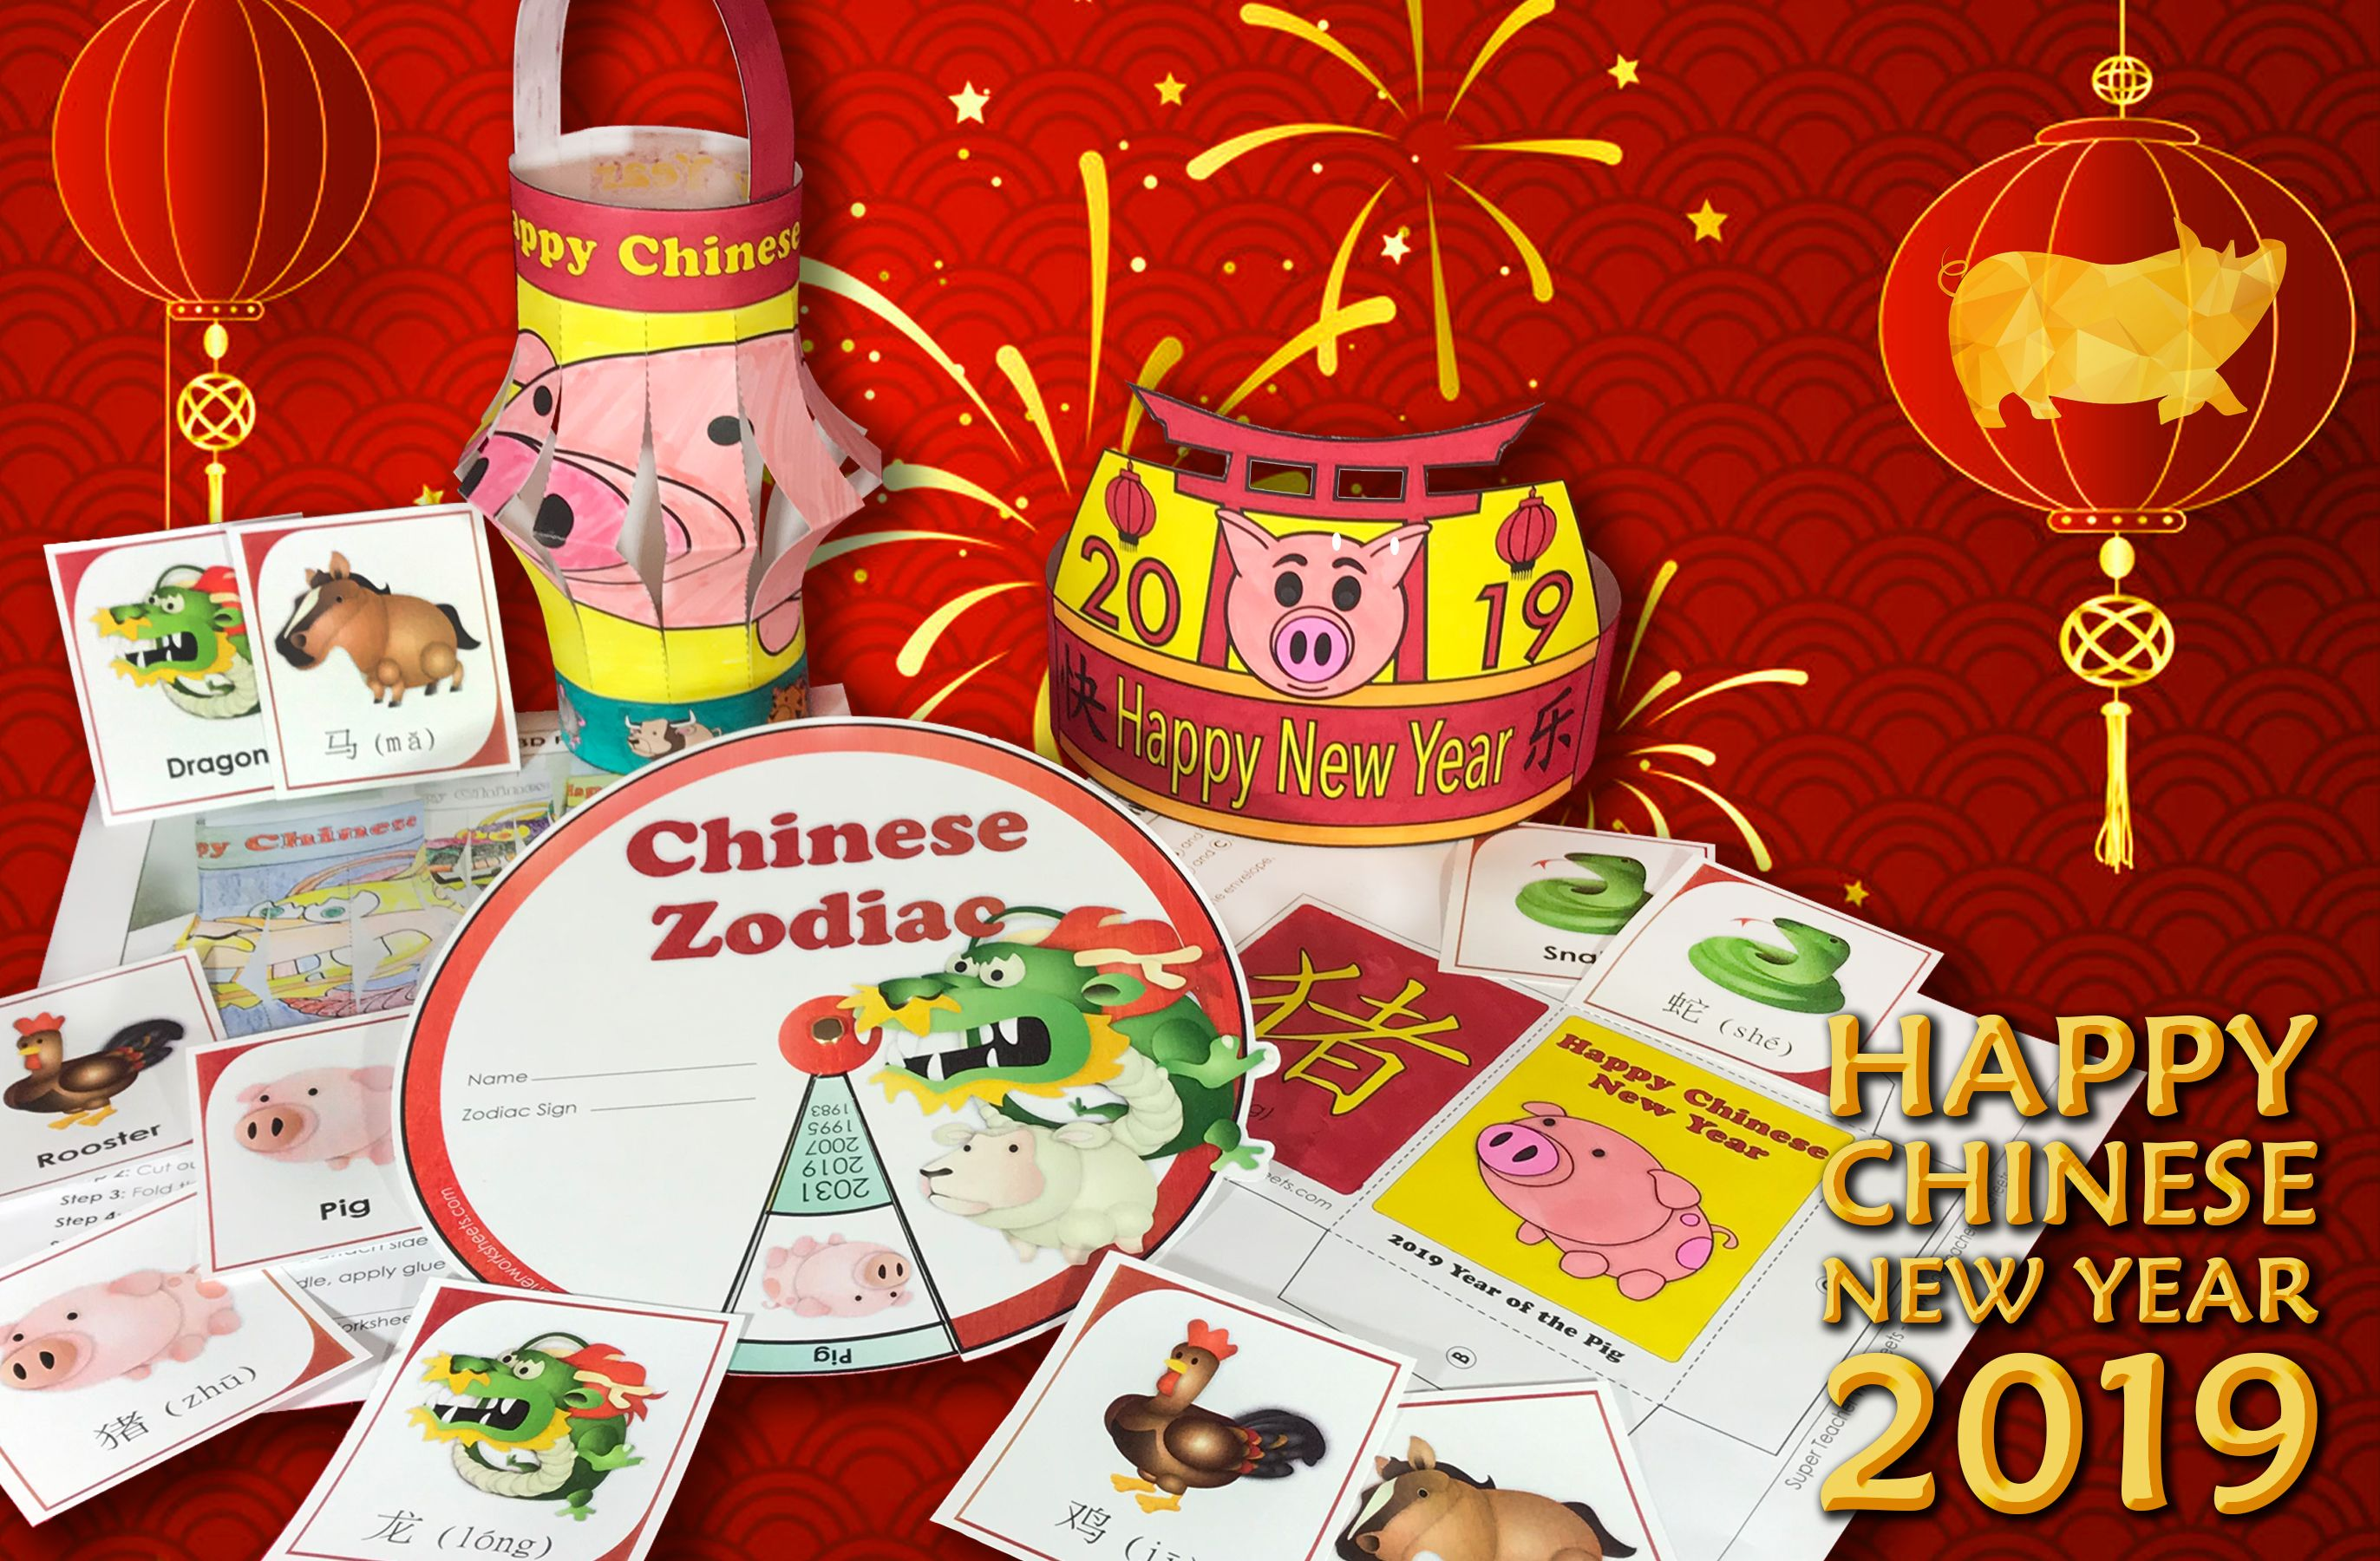 Celebrate The Yearofthepig With Chinesenewyear